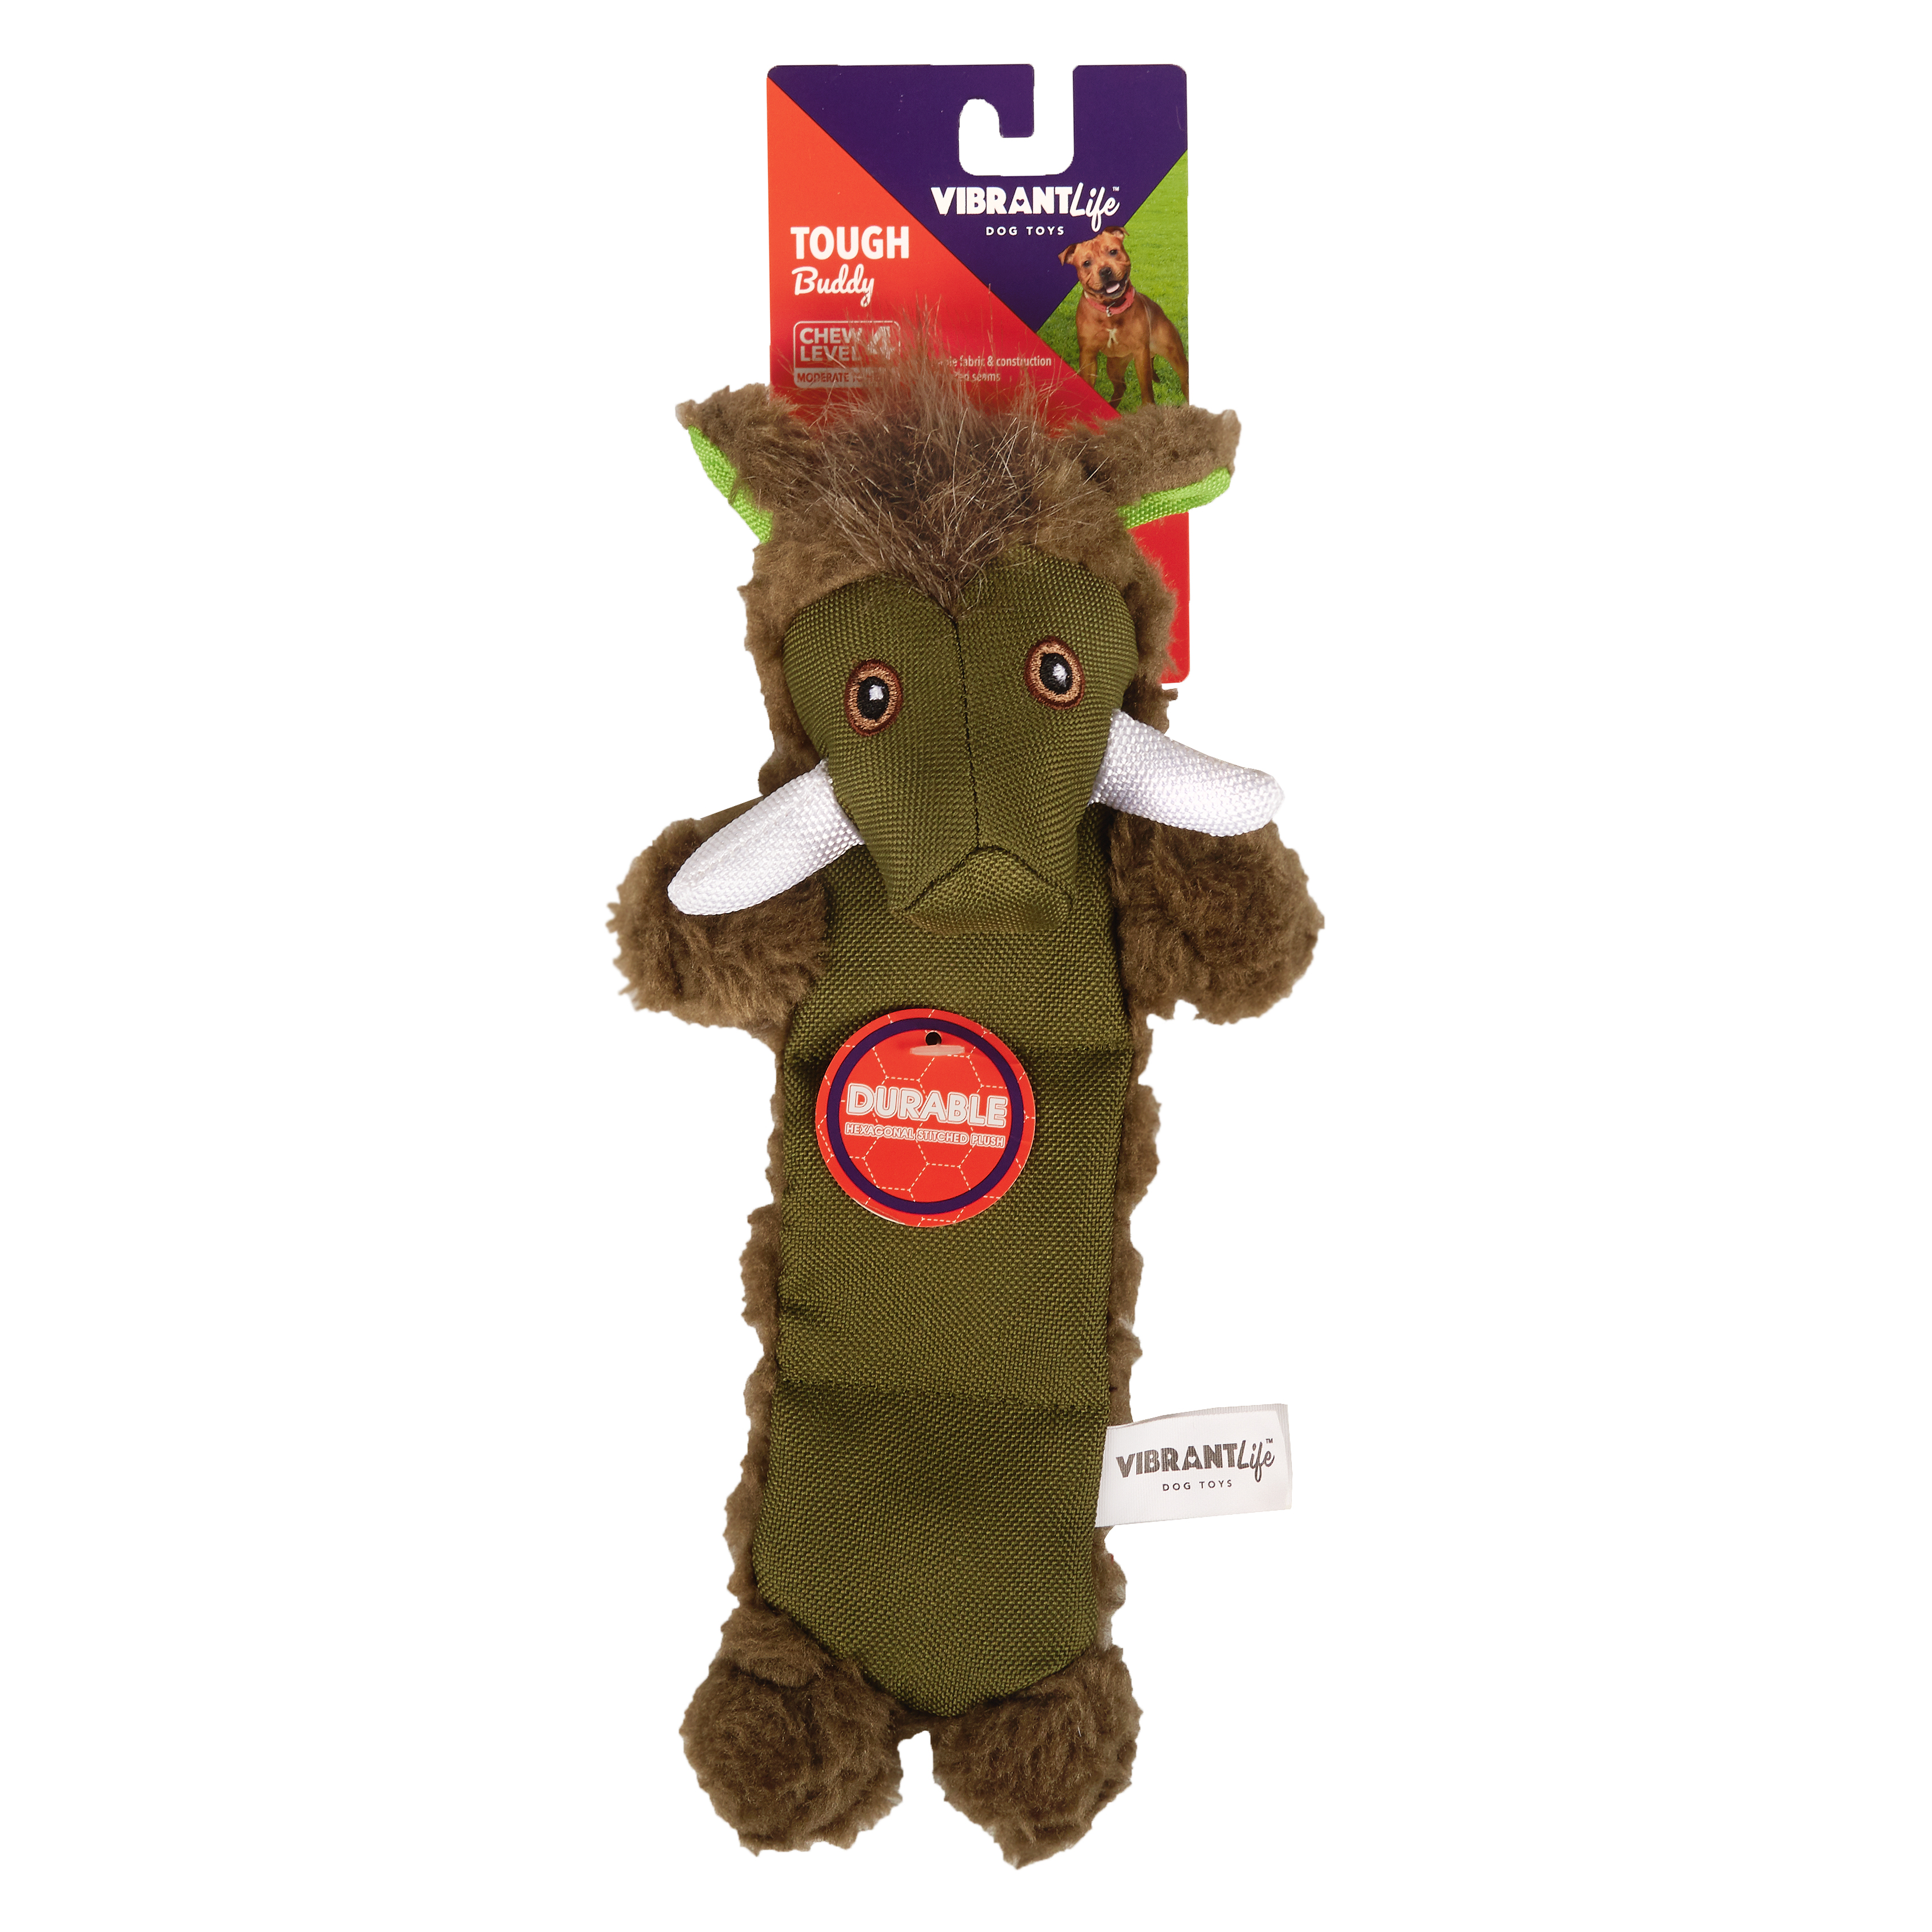 Vibrant Life Tough Buddy Dog Chew Toy, Boar